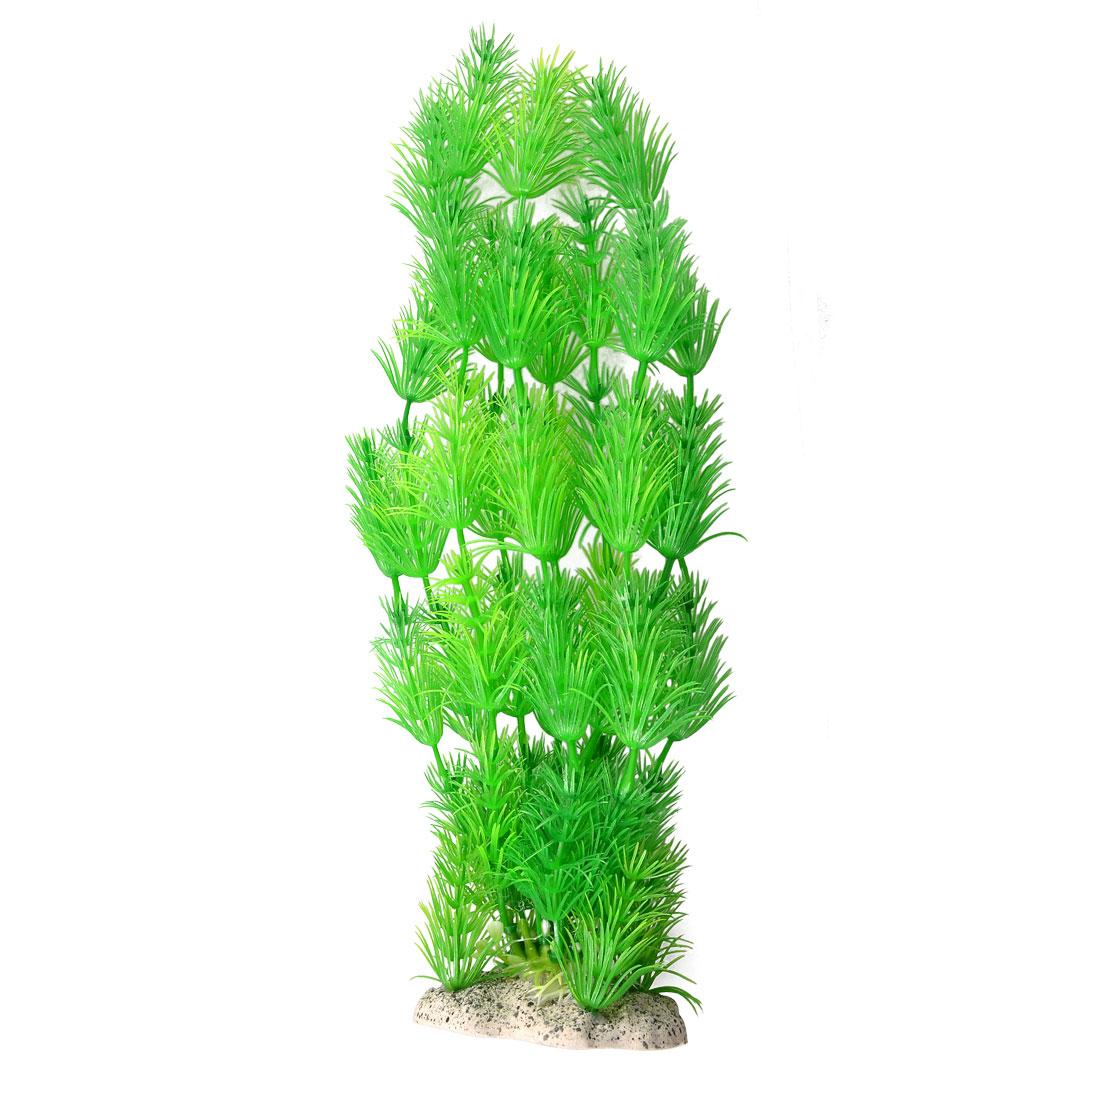 "Aquarium Plastic Green Needle Leaves Plant Decor 12.6"" High w Ceramic Base"